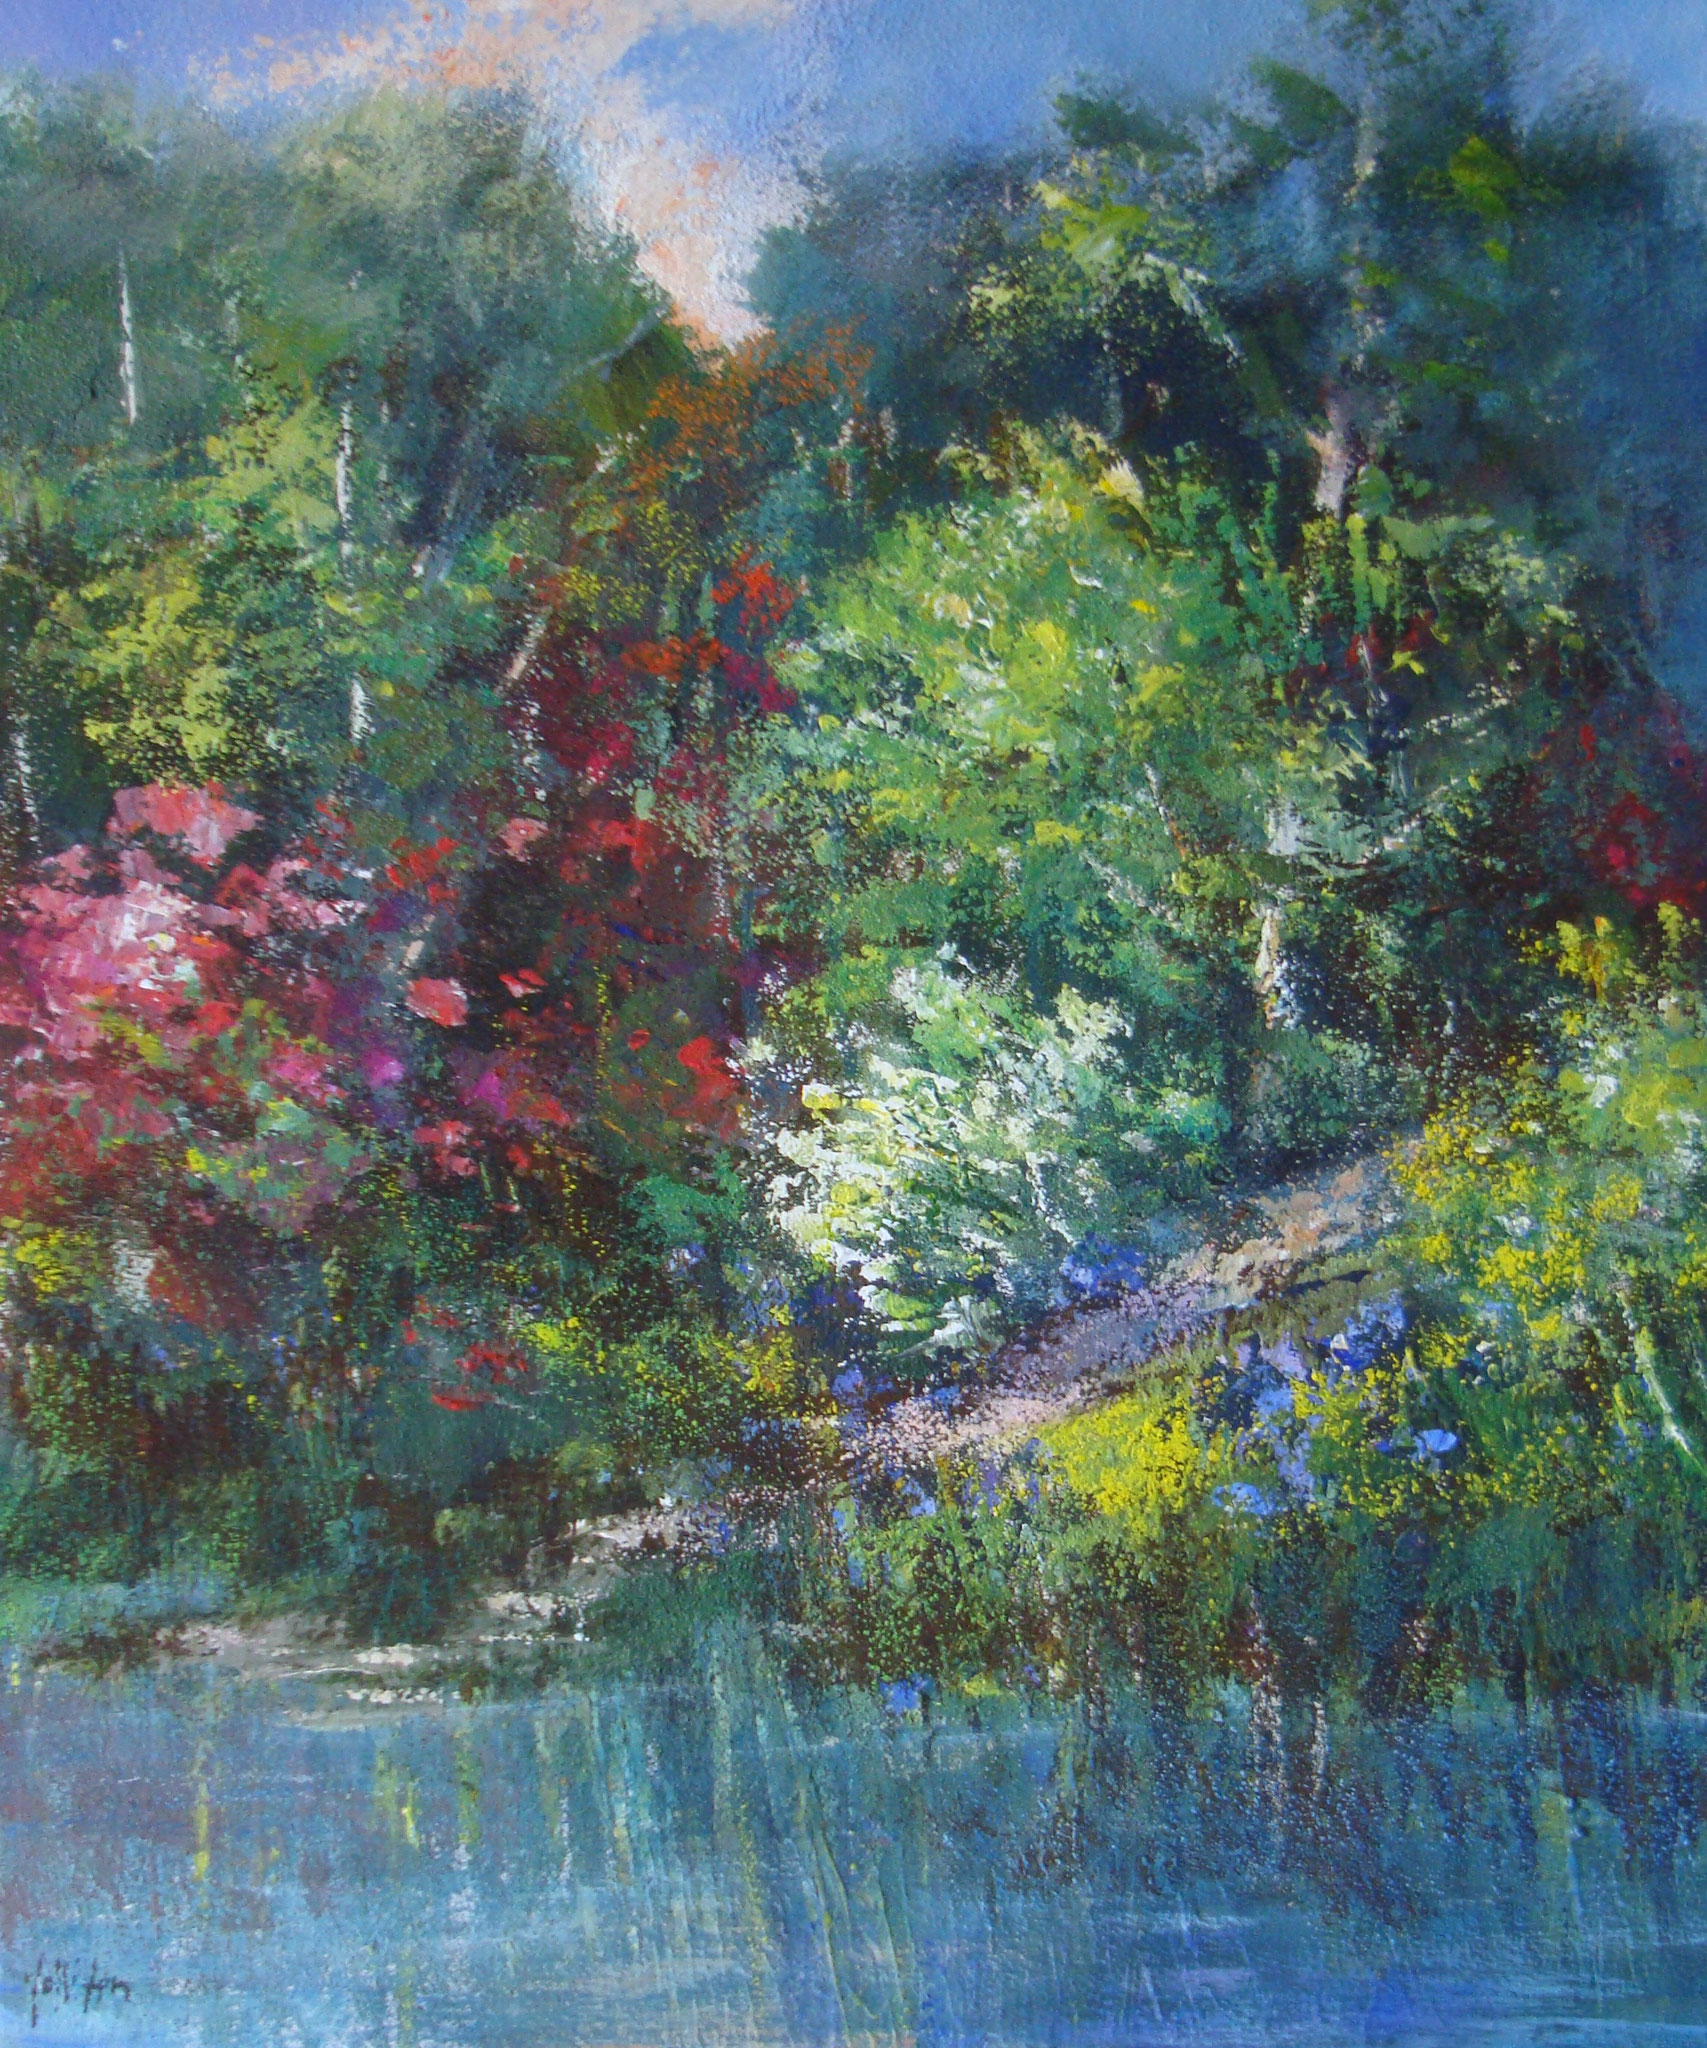 """Primavera esplosa"" 2017 - Öl auf Leinwand - 60x50 cm"